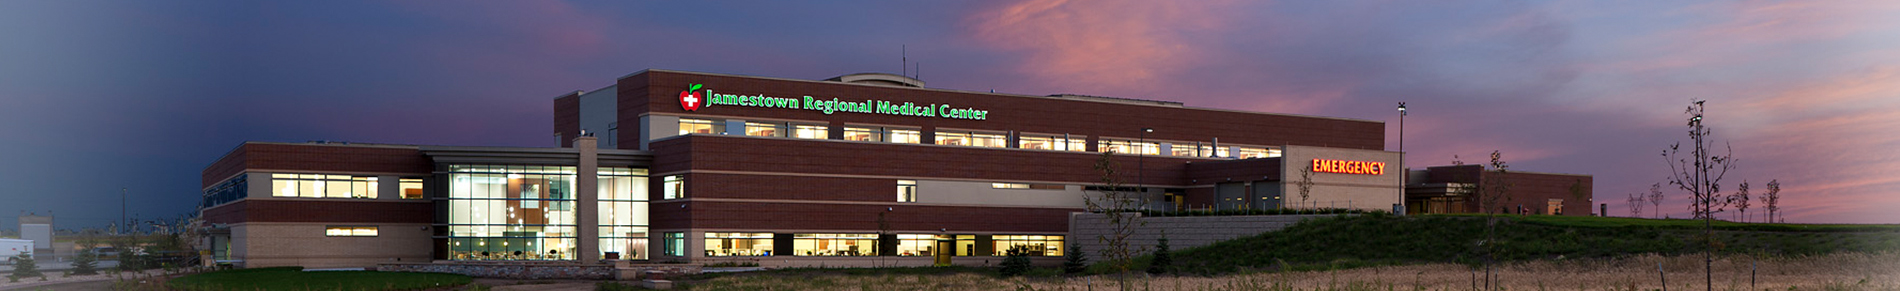 Jamestown Regional Medical Center